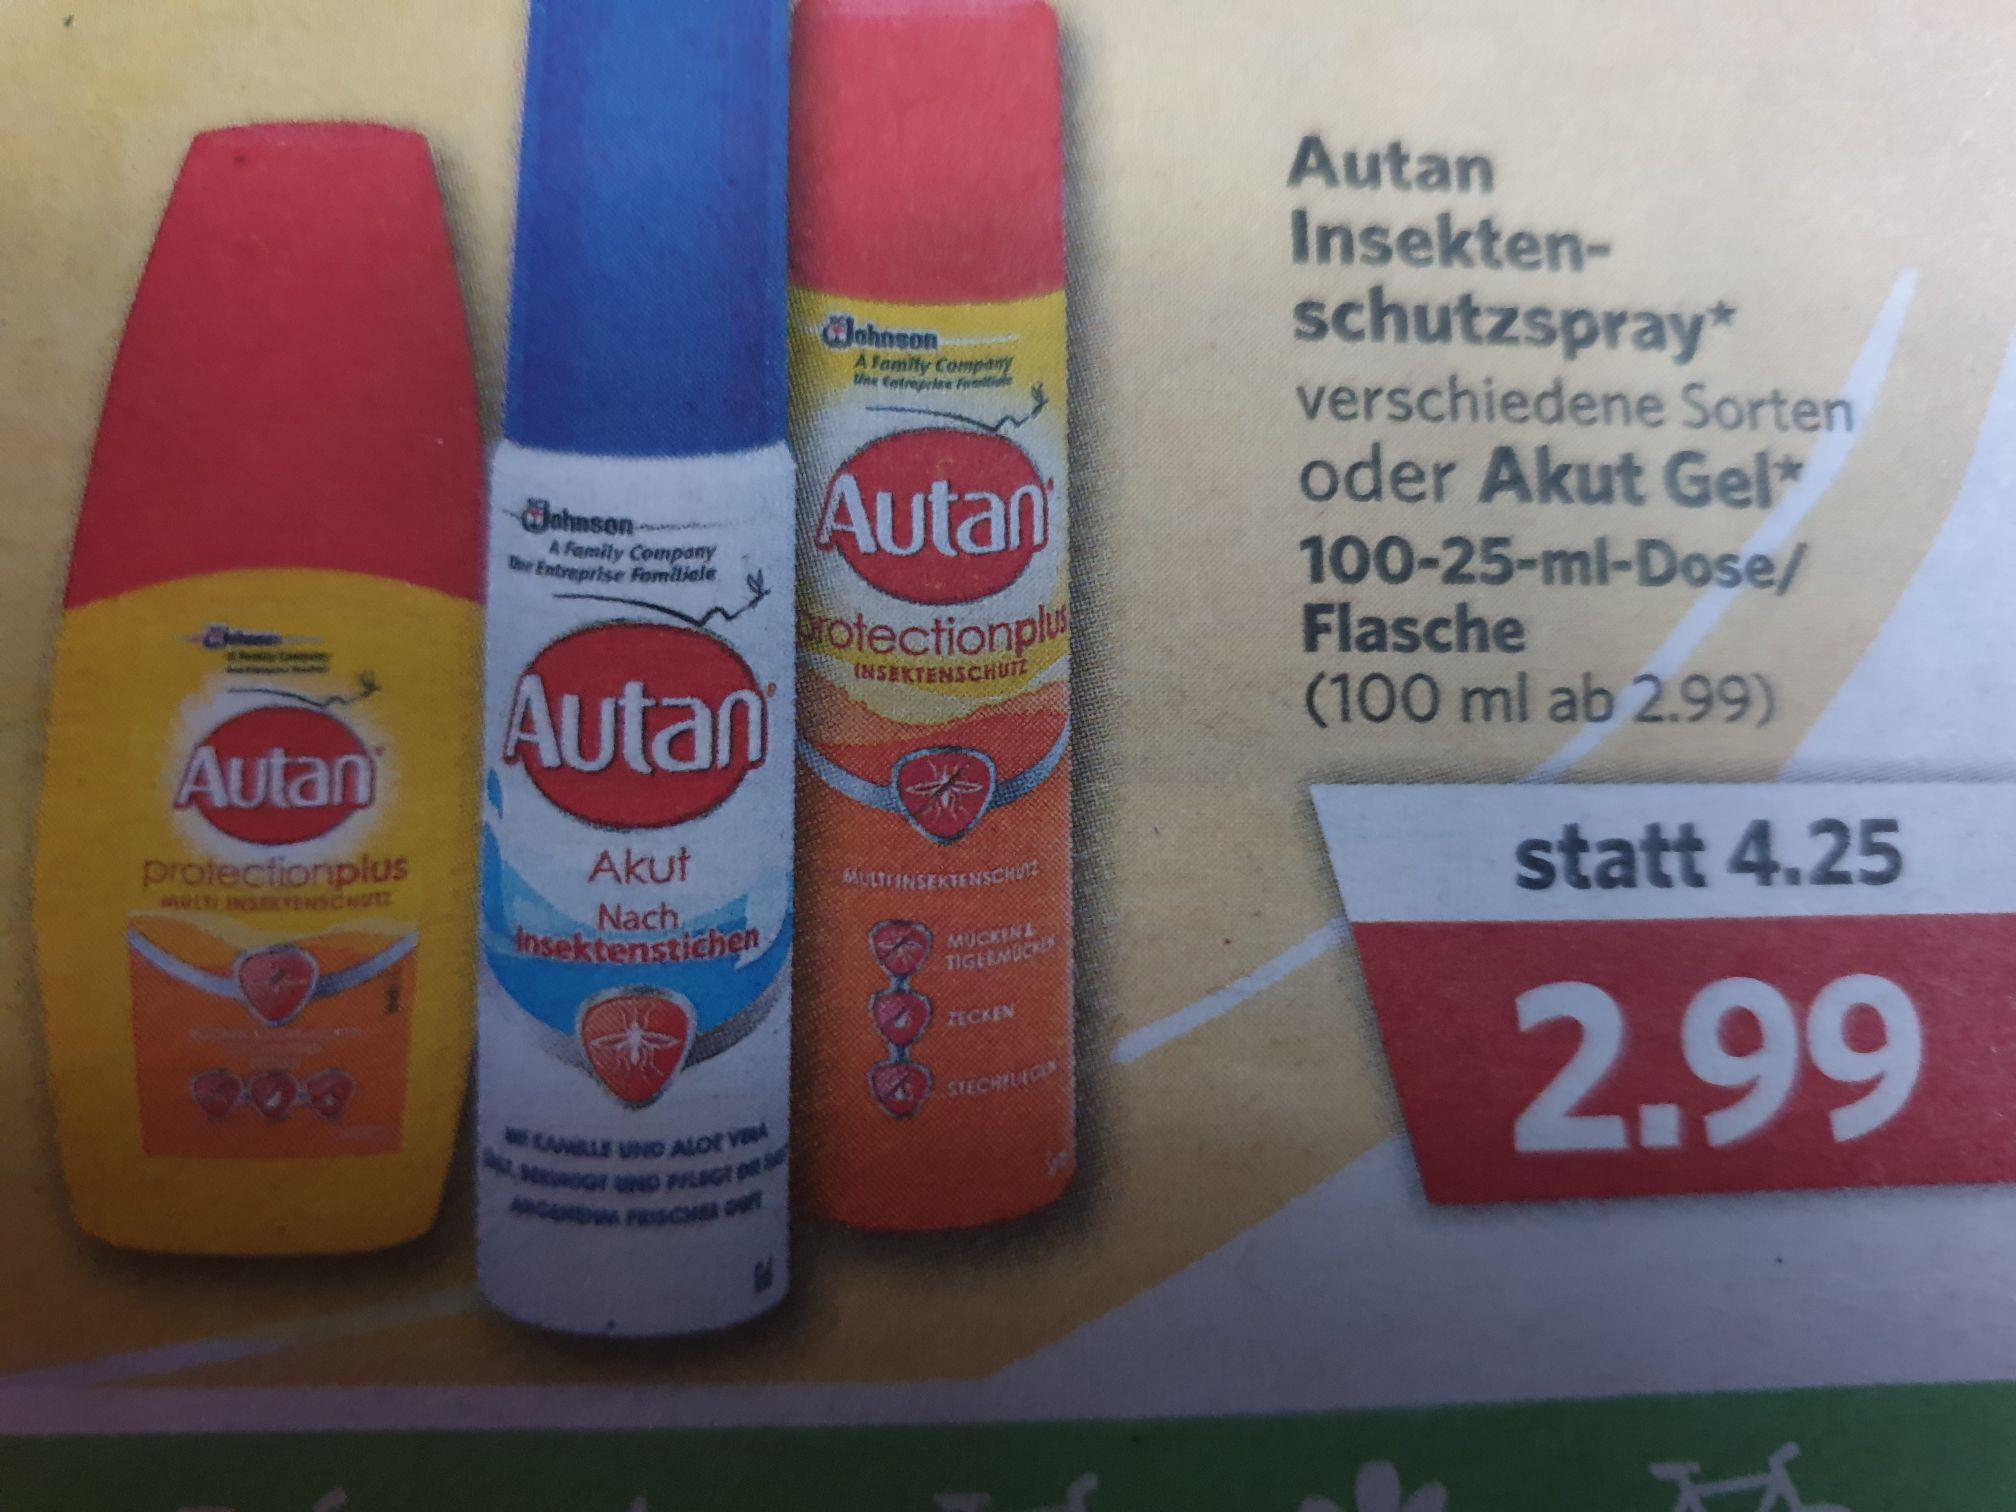 (Jibi/Combi Markt) Autan Insektenschutzspray/Gel für 2,99€ ( lokal)